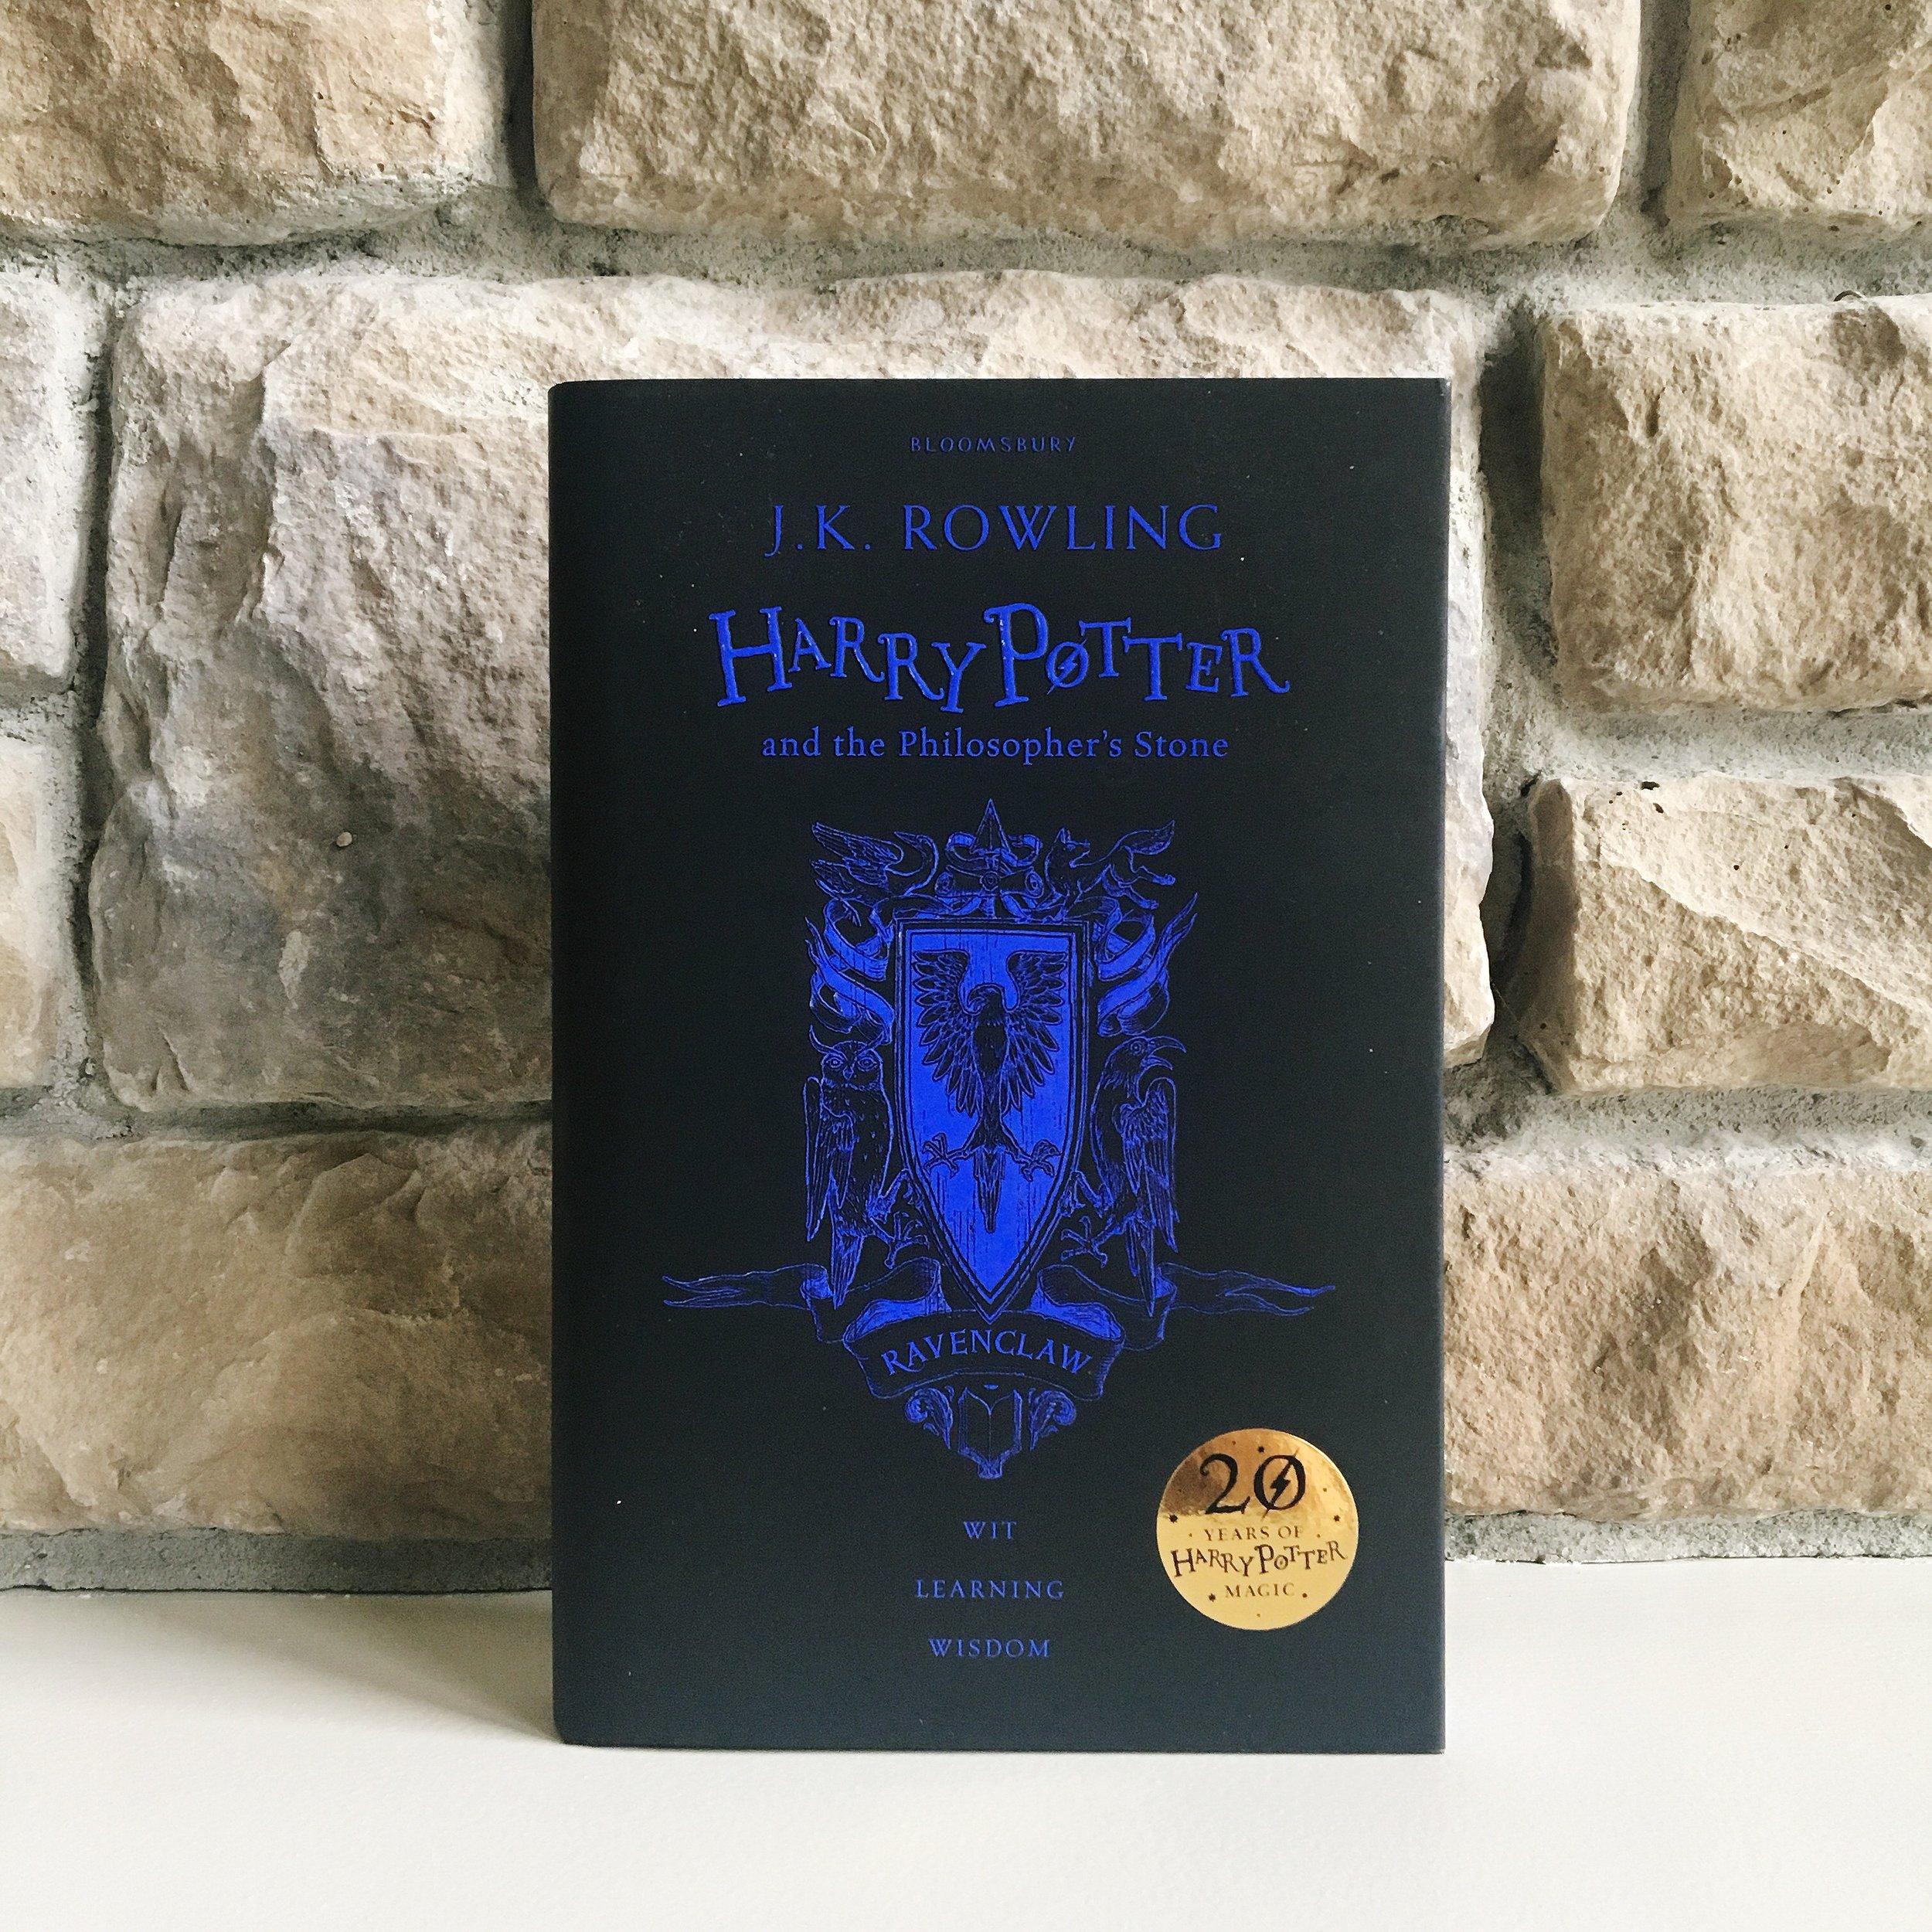 Top 5 Tips to Conquier a Reading Slump - Harry Potter.JPG